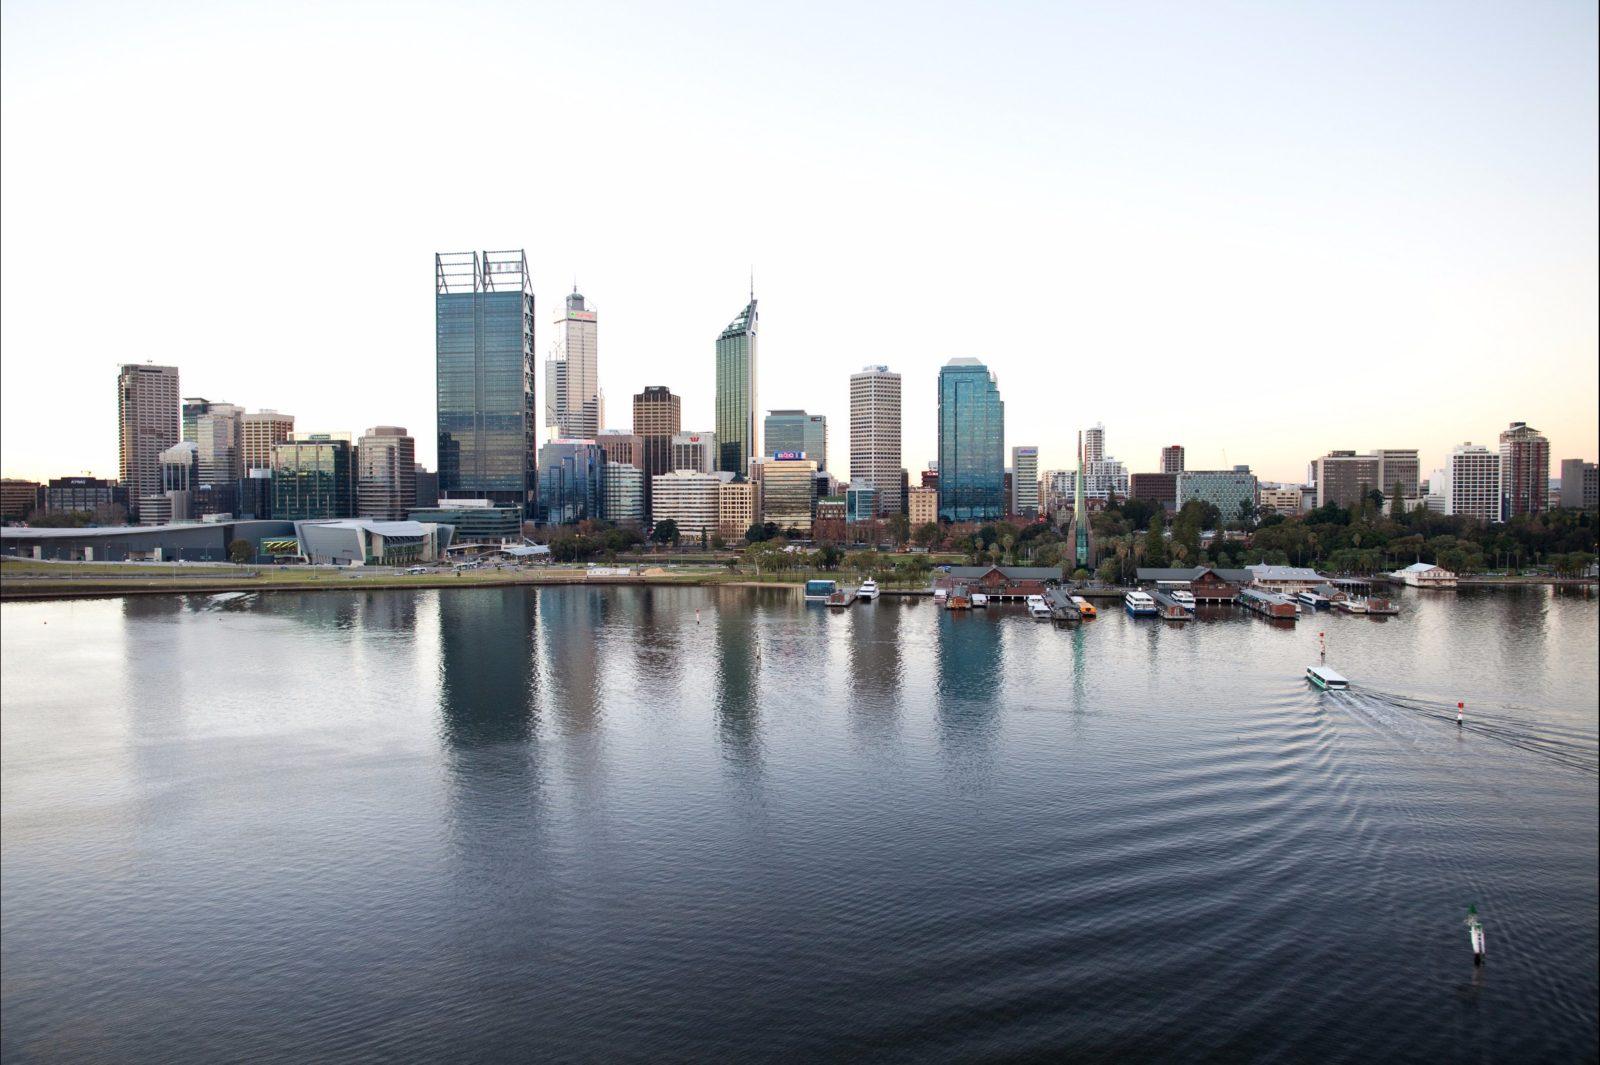 Swan River Foreshore, Perth, Western Australia